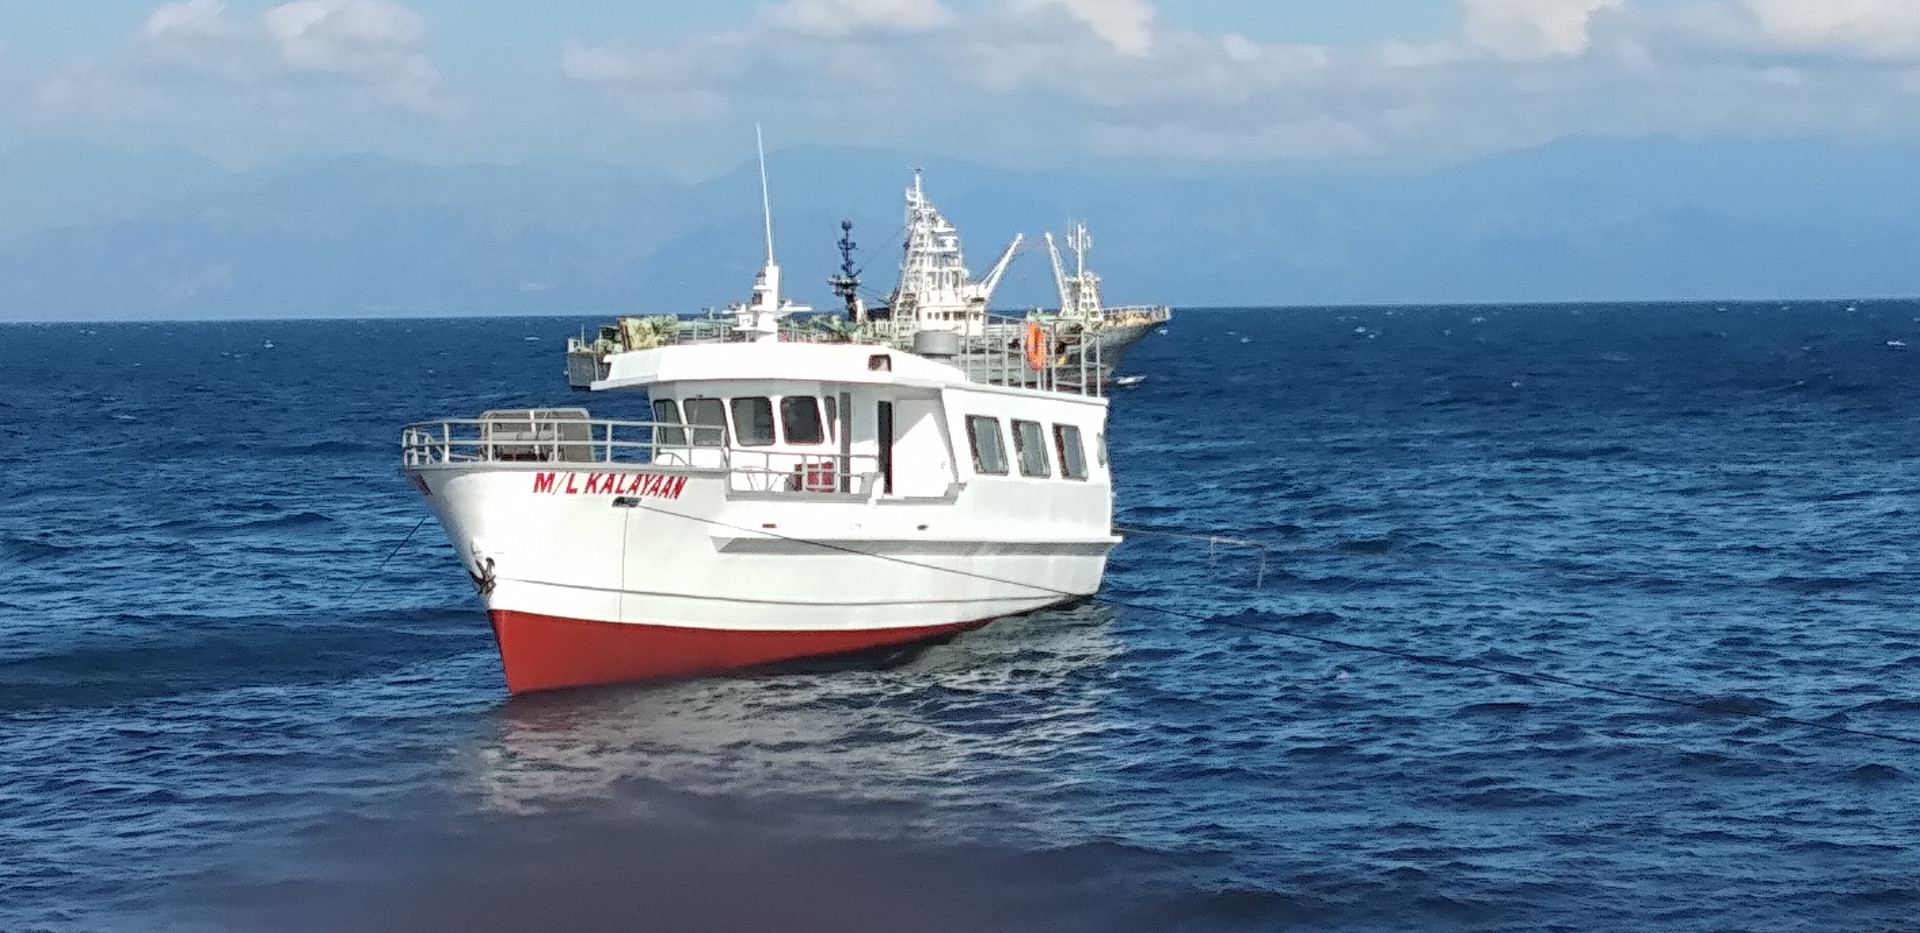 69 ftr. Boat  Specification Length     : 69 ft. Beam       : 16.4 ft. Depth       : 9.84 ft. Capacity   : 45 pax  Inboard Engine